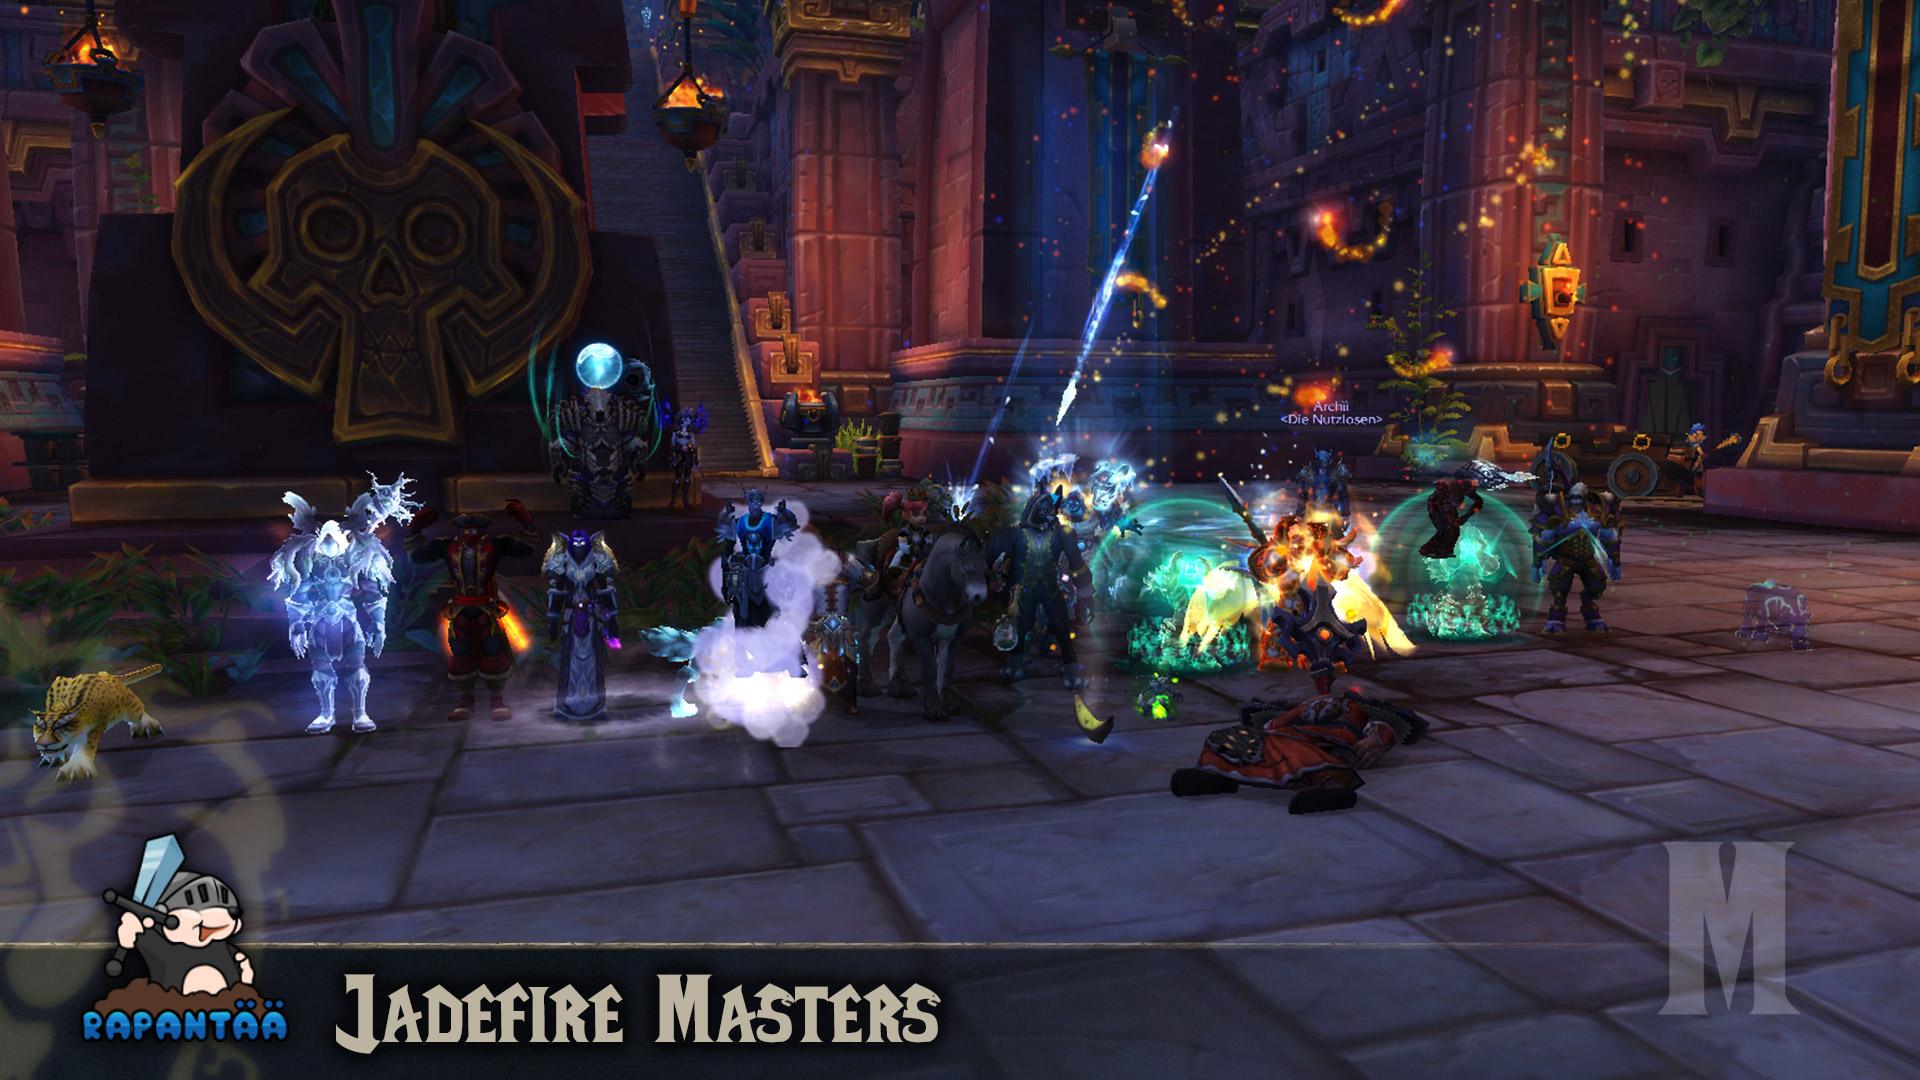 jadefire-masters-m-07.03.2019